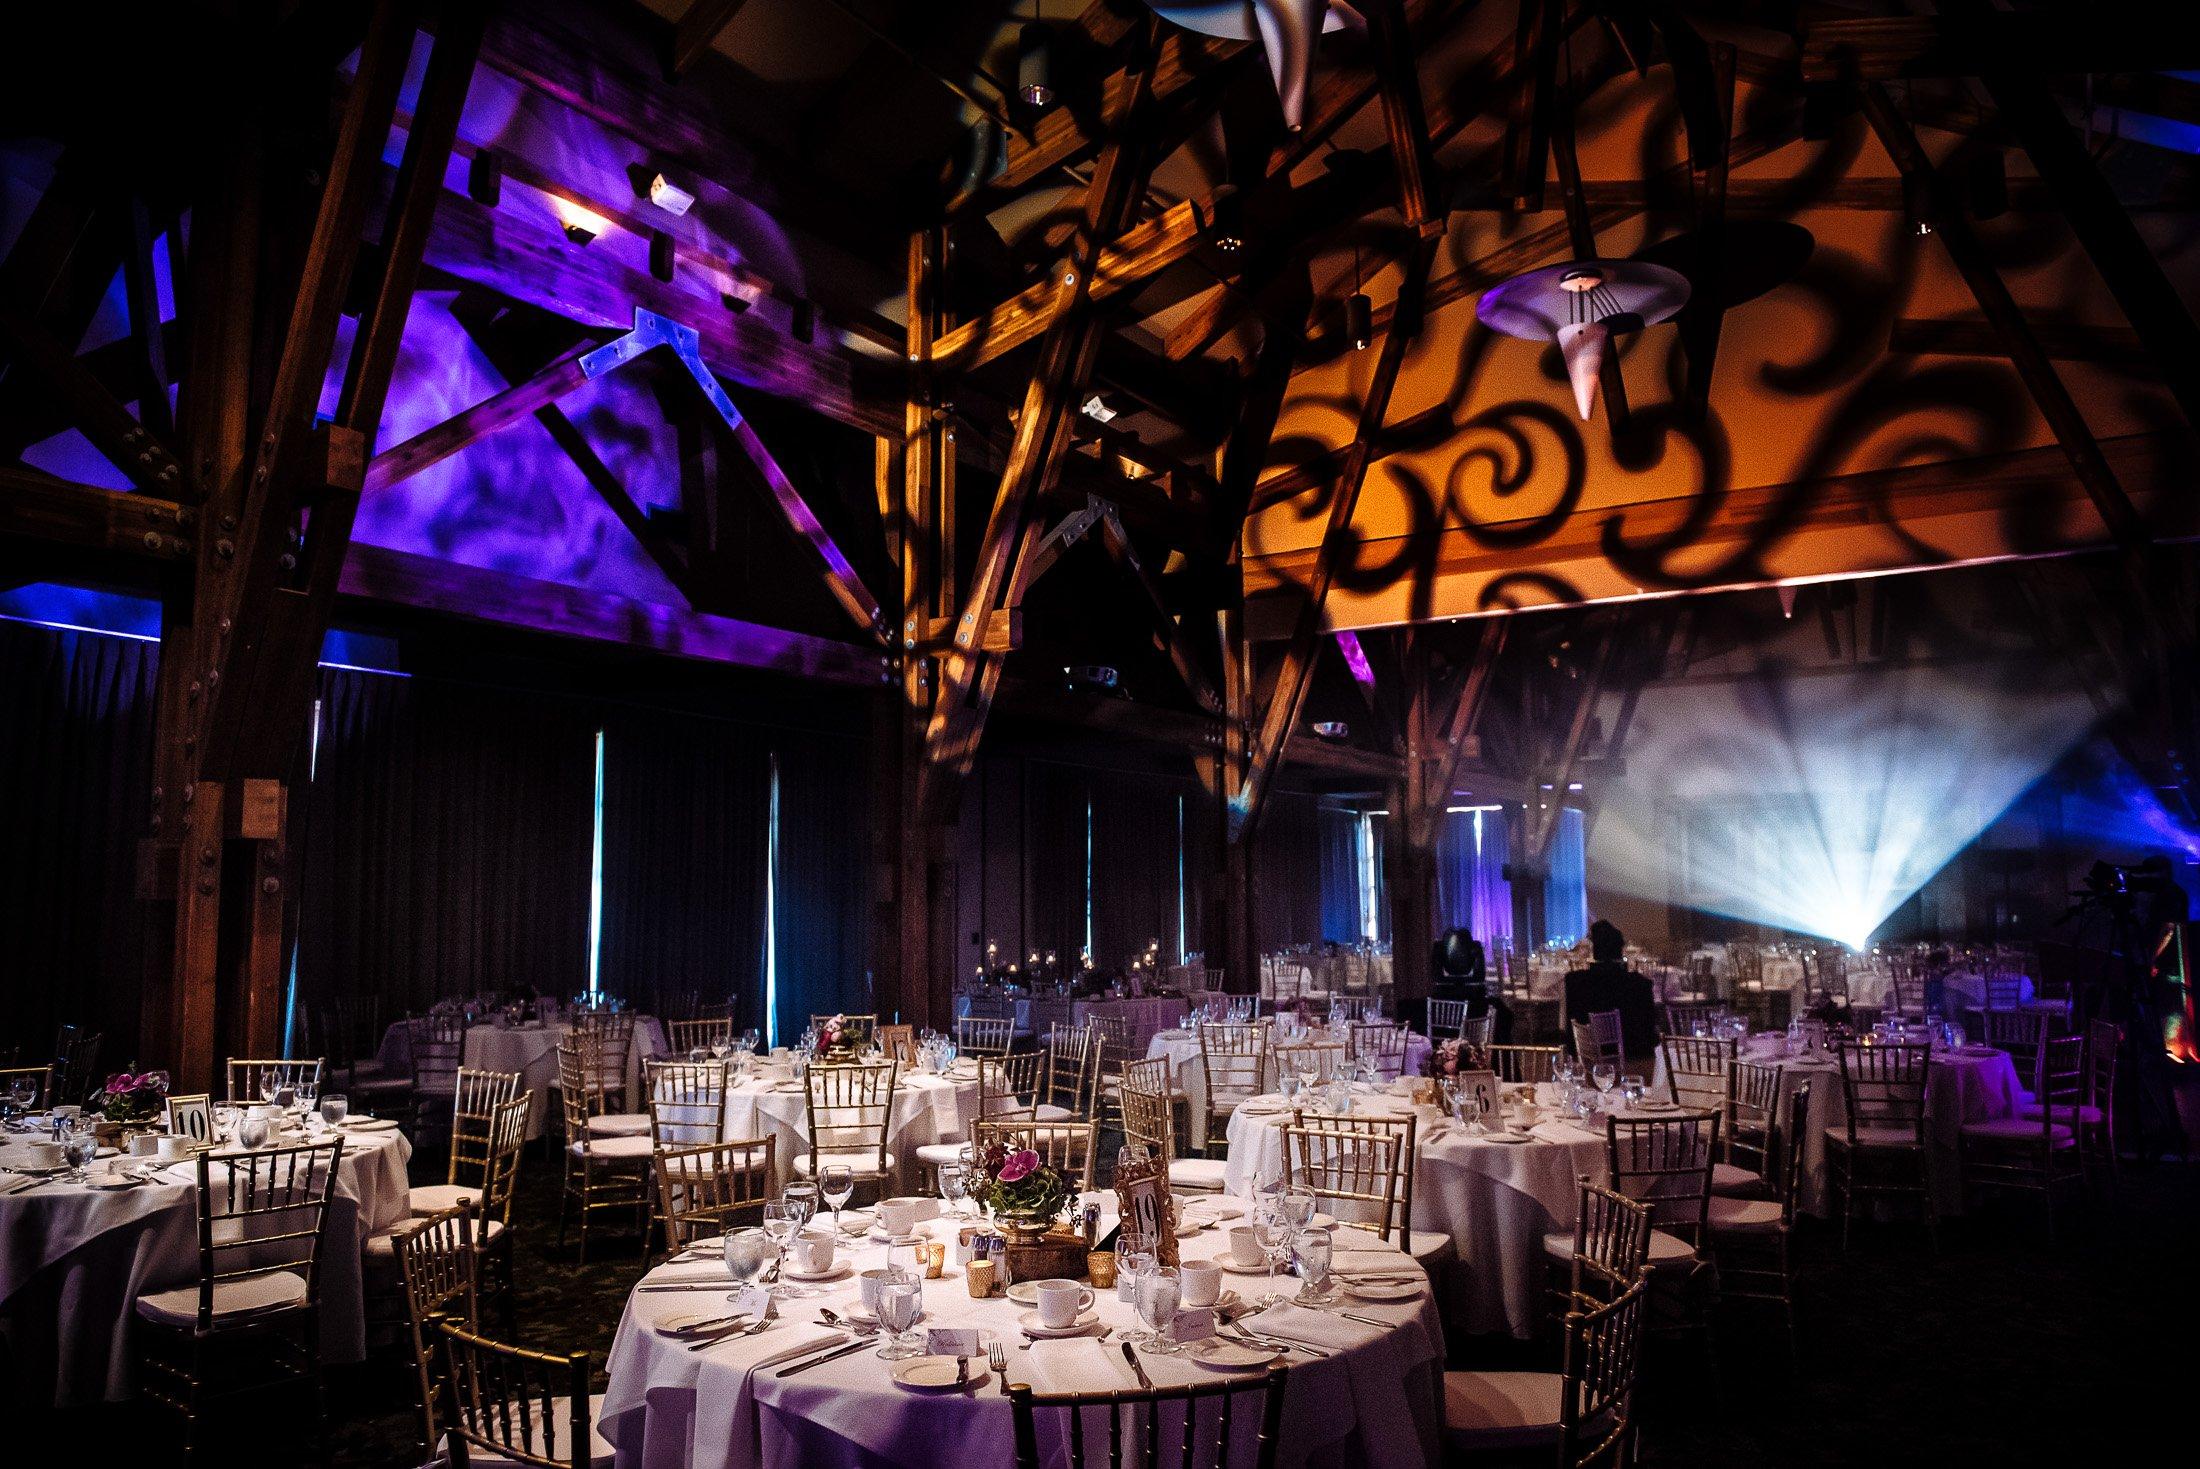 Wedding Reception Lighting Photography: Pursell Photography Inc Vancouver